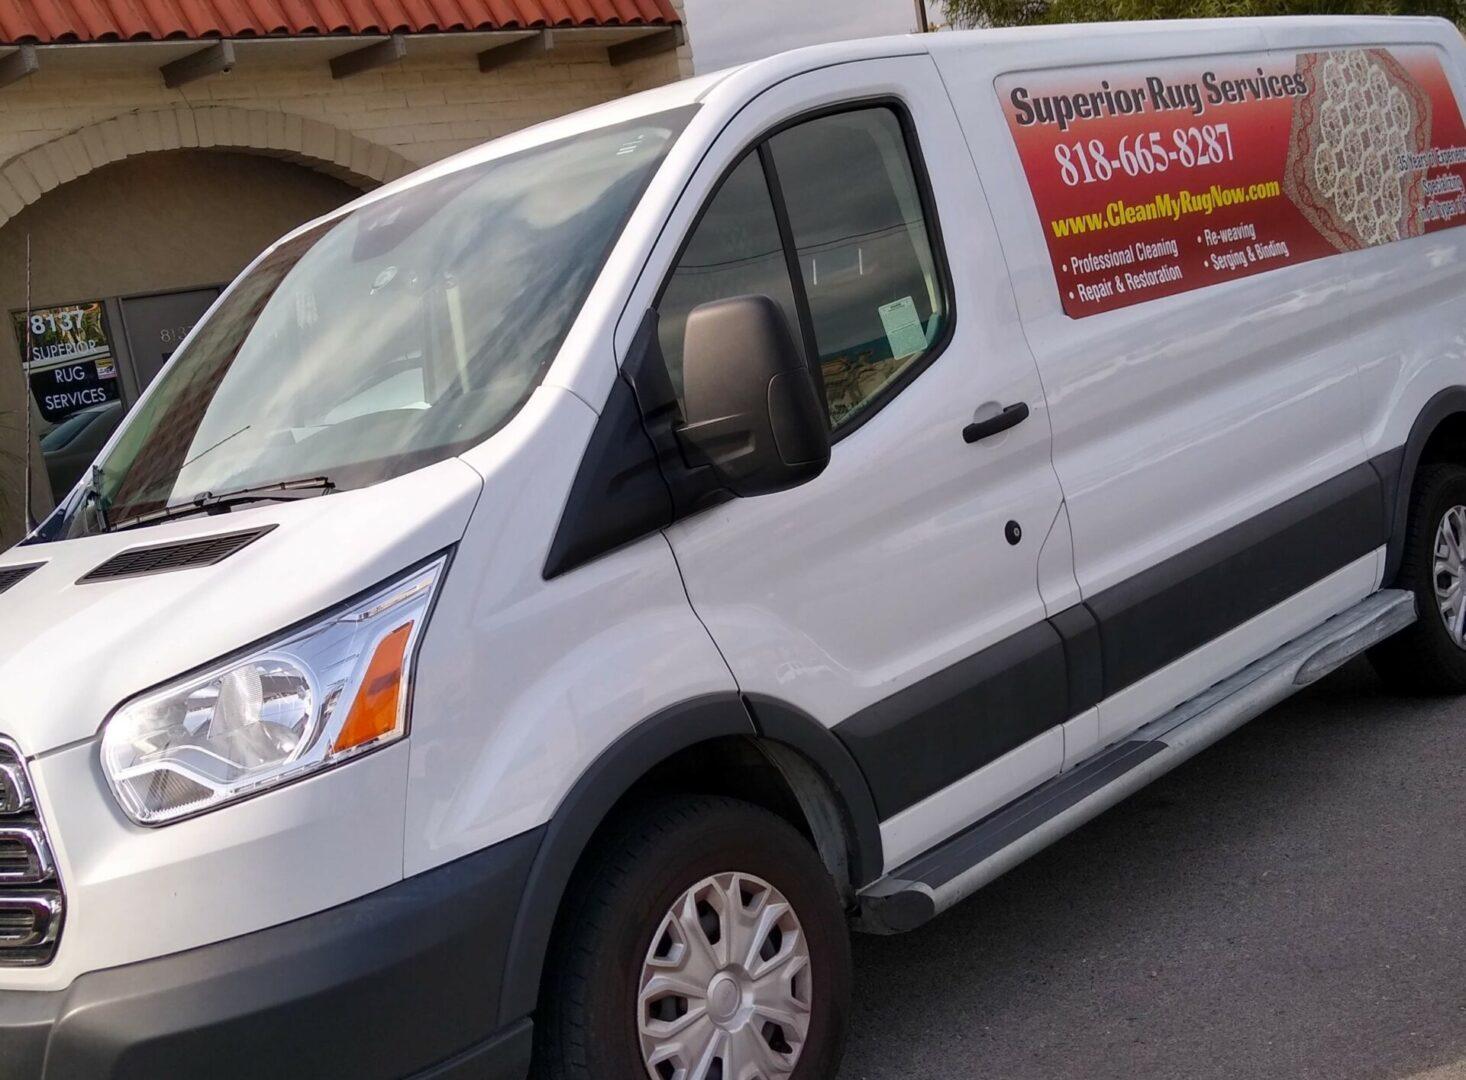 Picture of the van